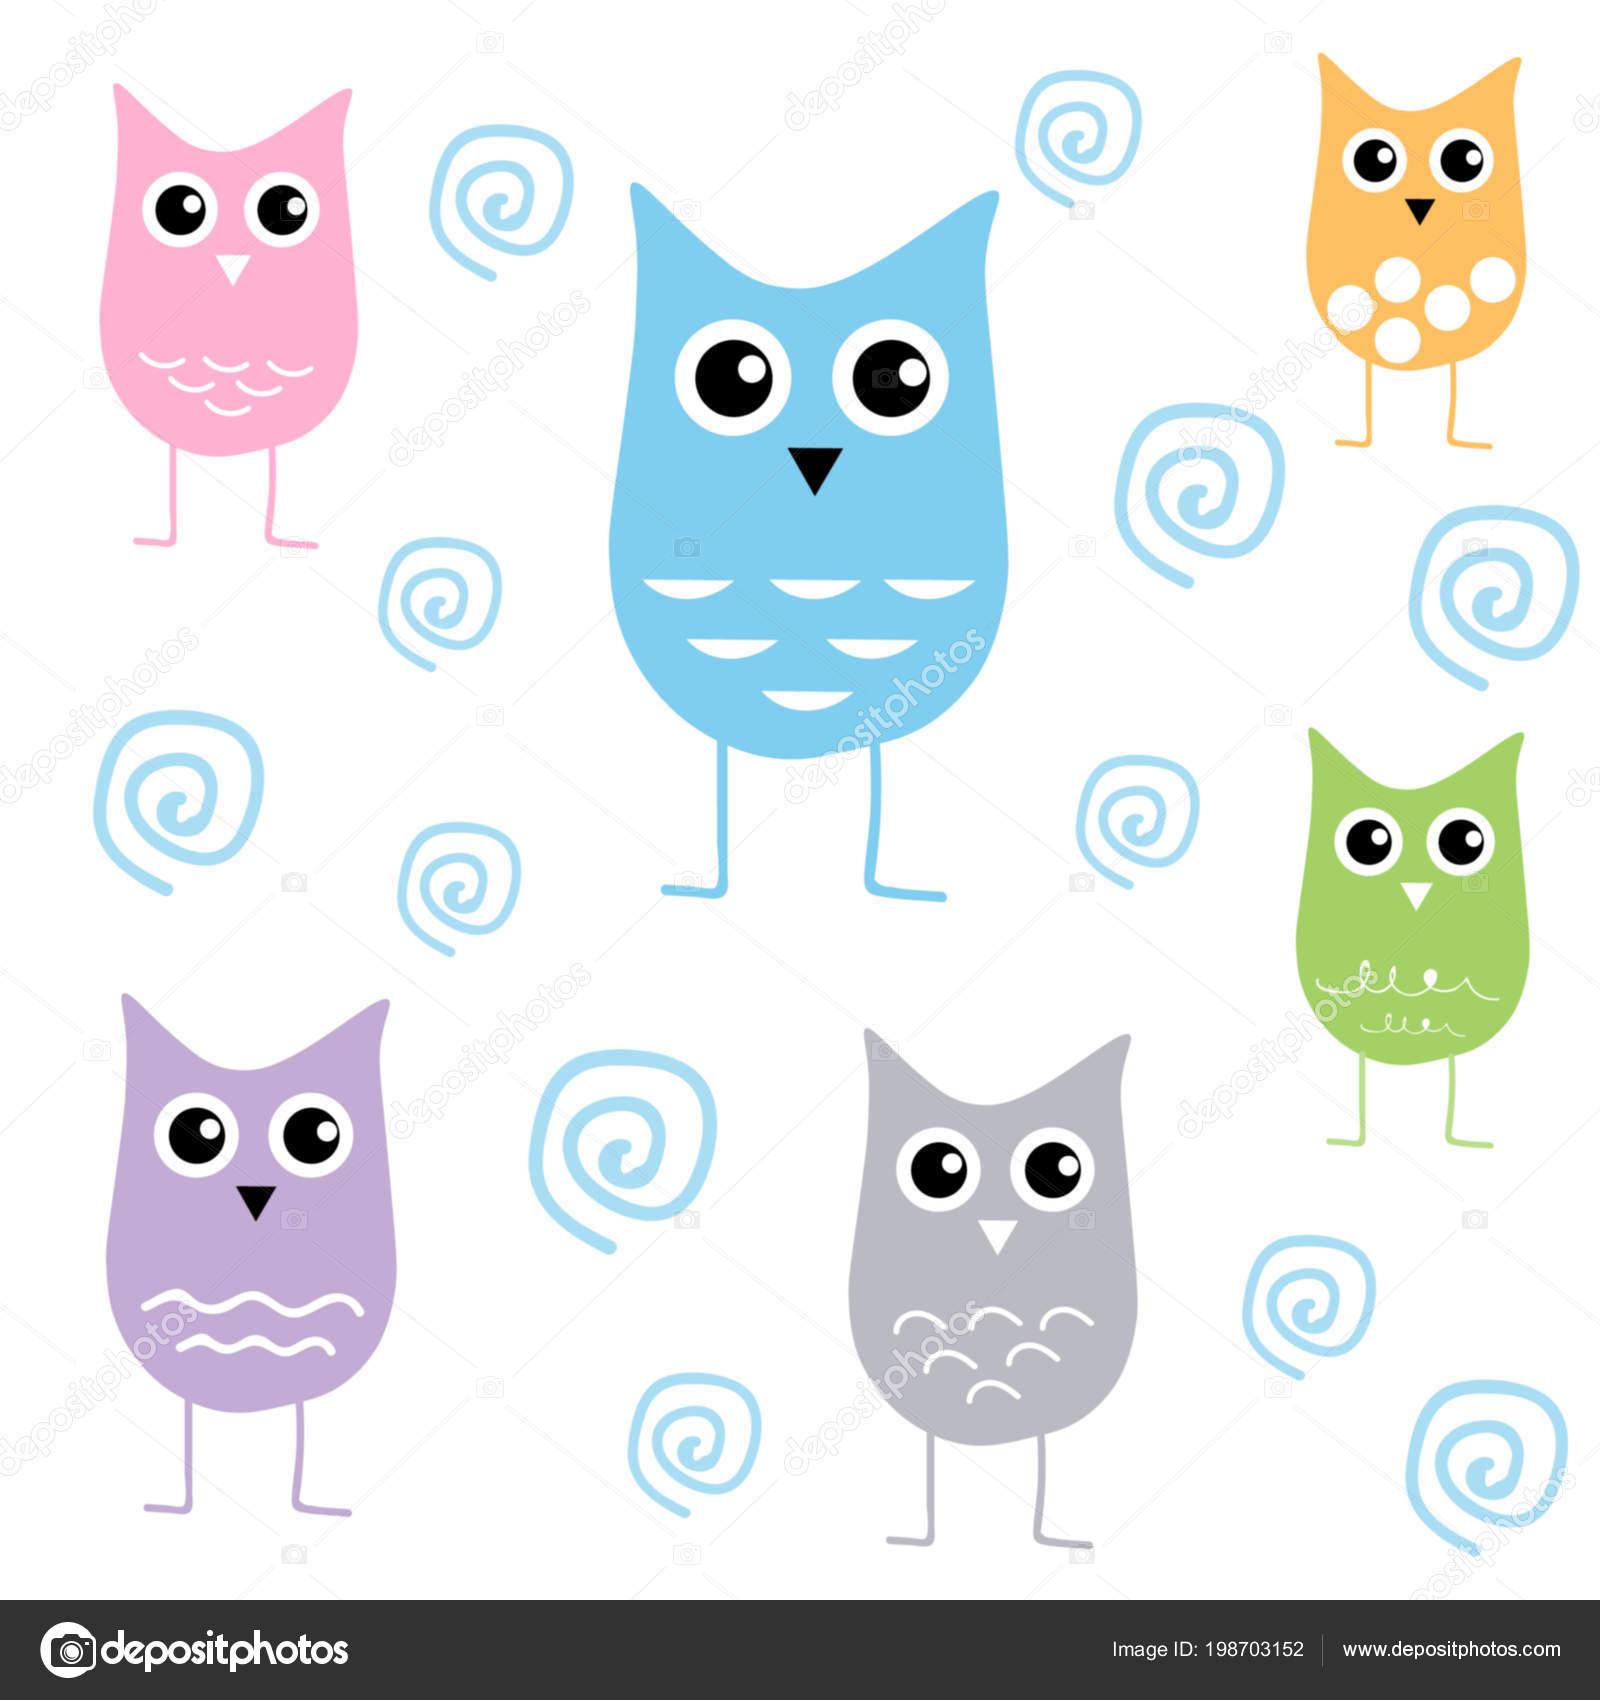 Owl Printing